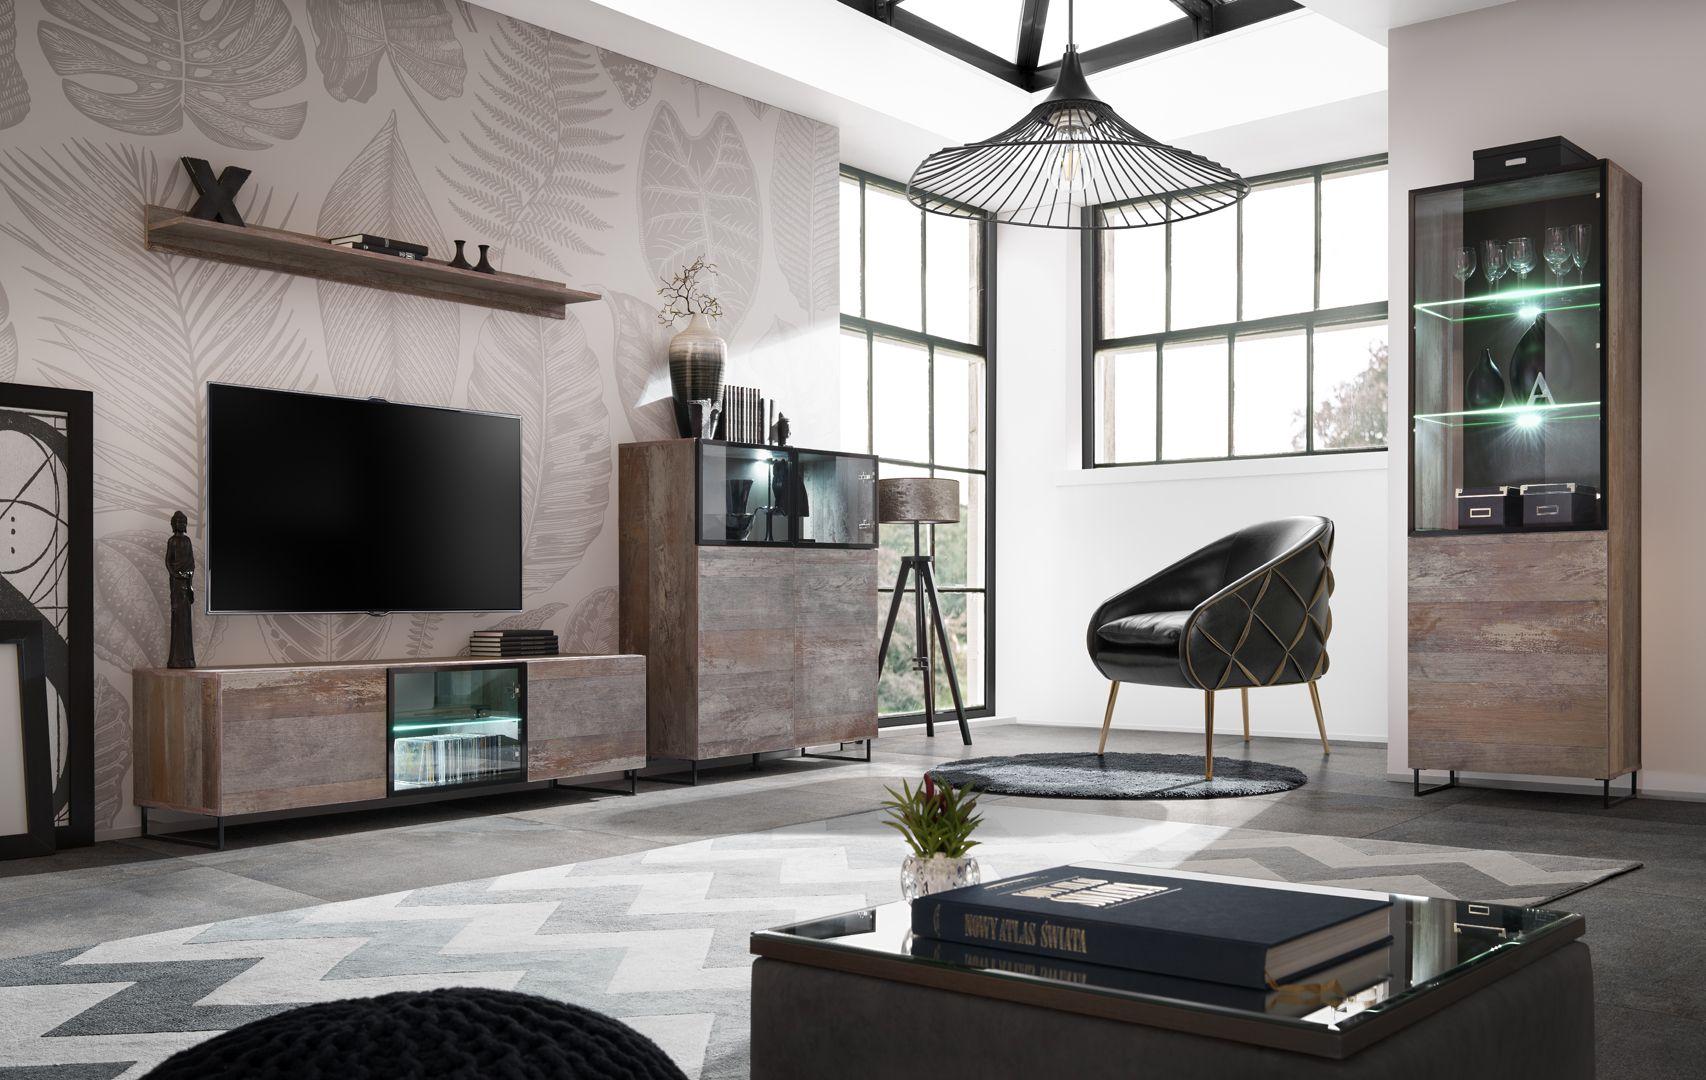 Modern Tv Wall Unit Entertainment Sets Furniture Entertainment Wall Units Living Roo In 2020 Modern Tv Wall Units Living Room Wall Units Entertainment Wall Units #tv #armoire #for #living #room